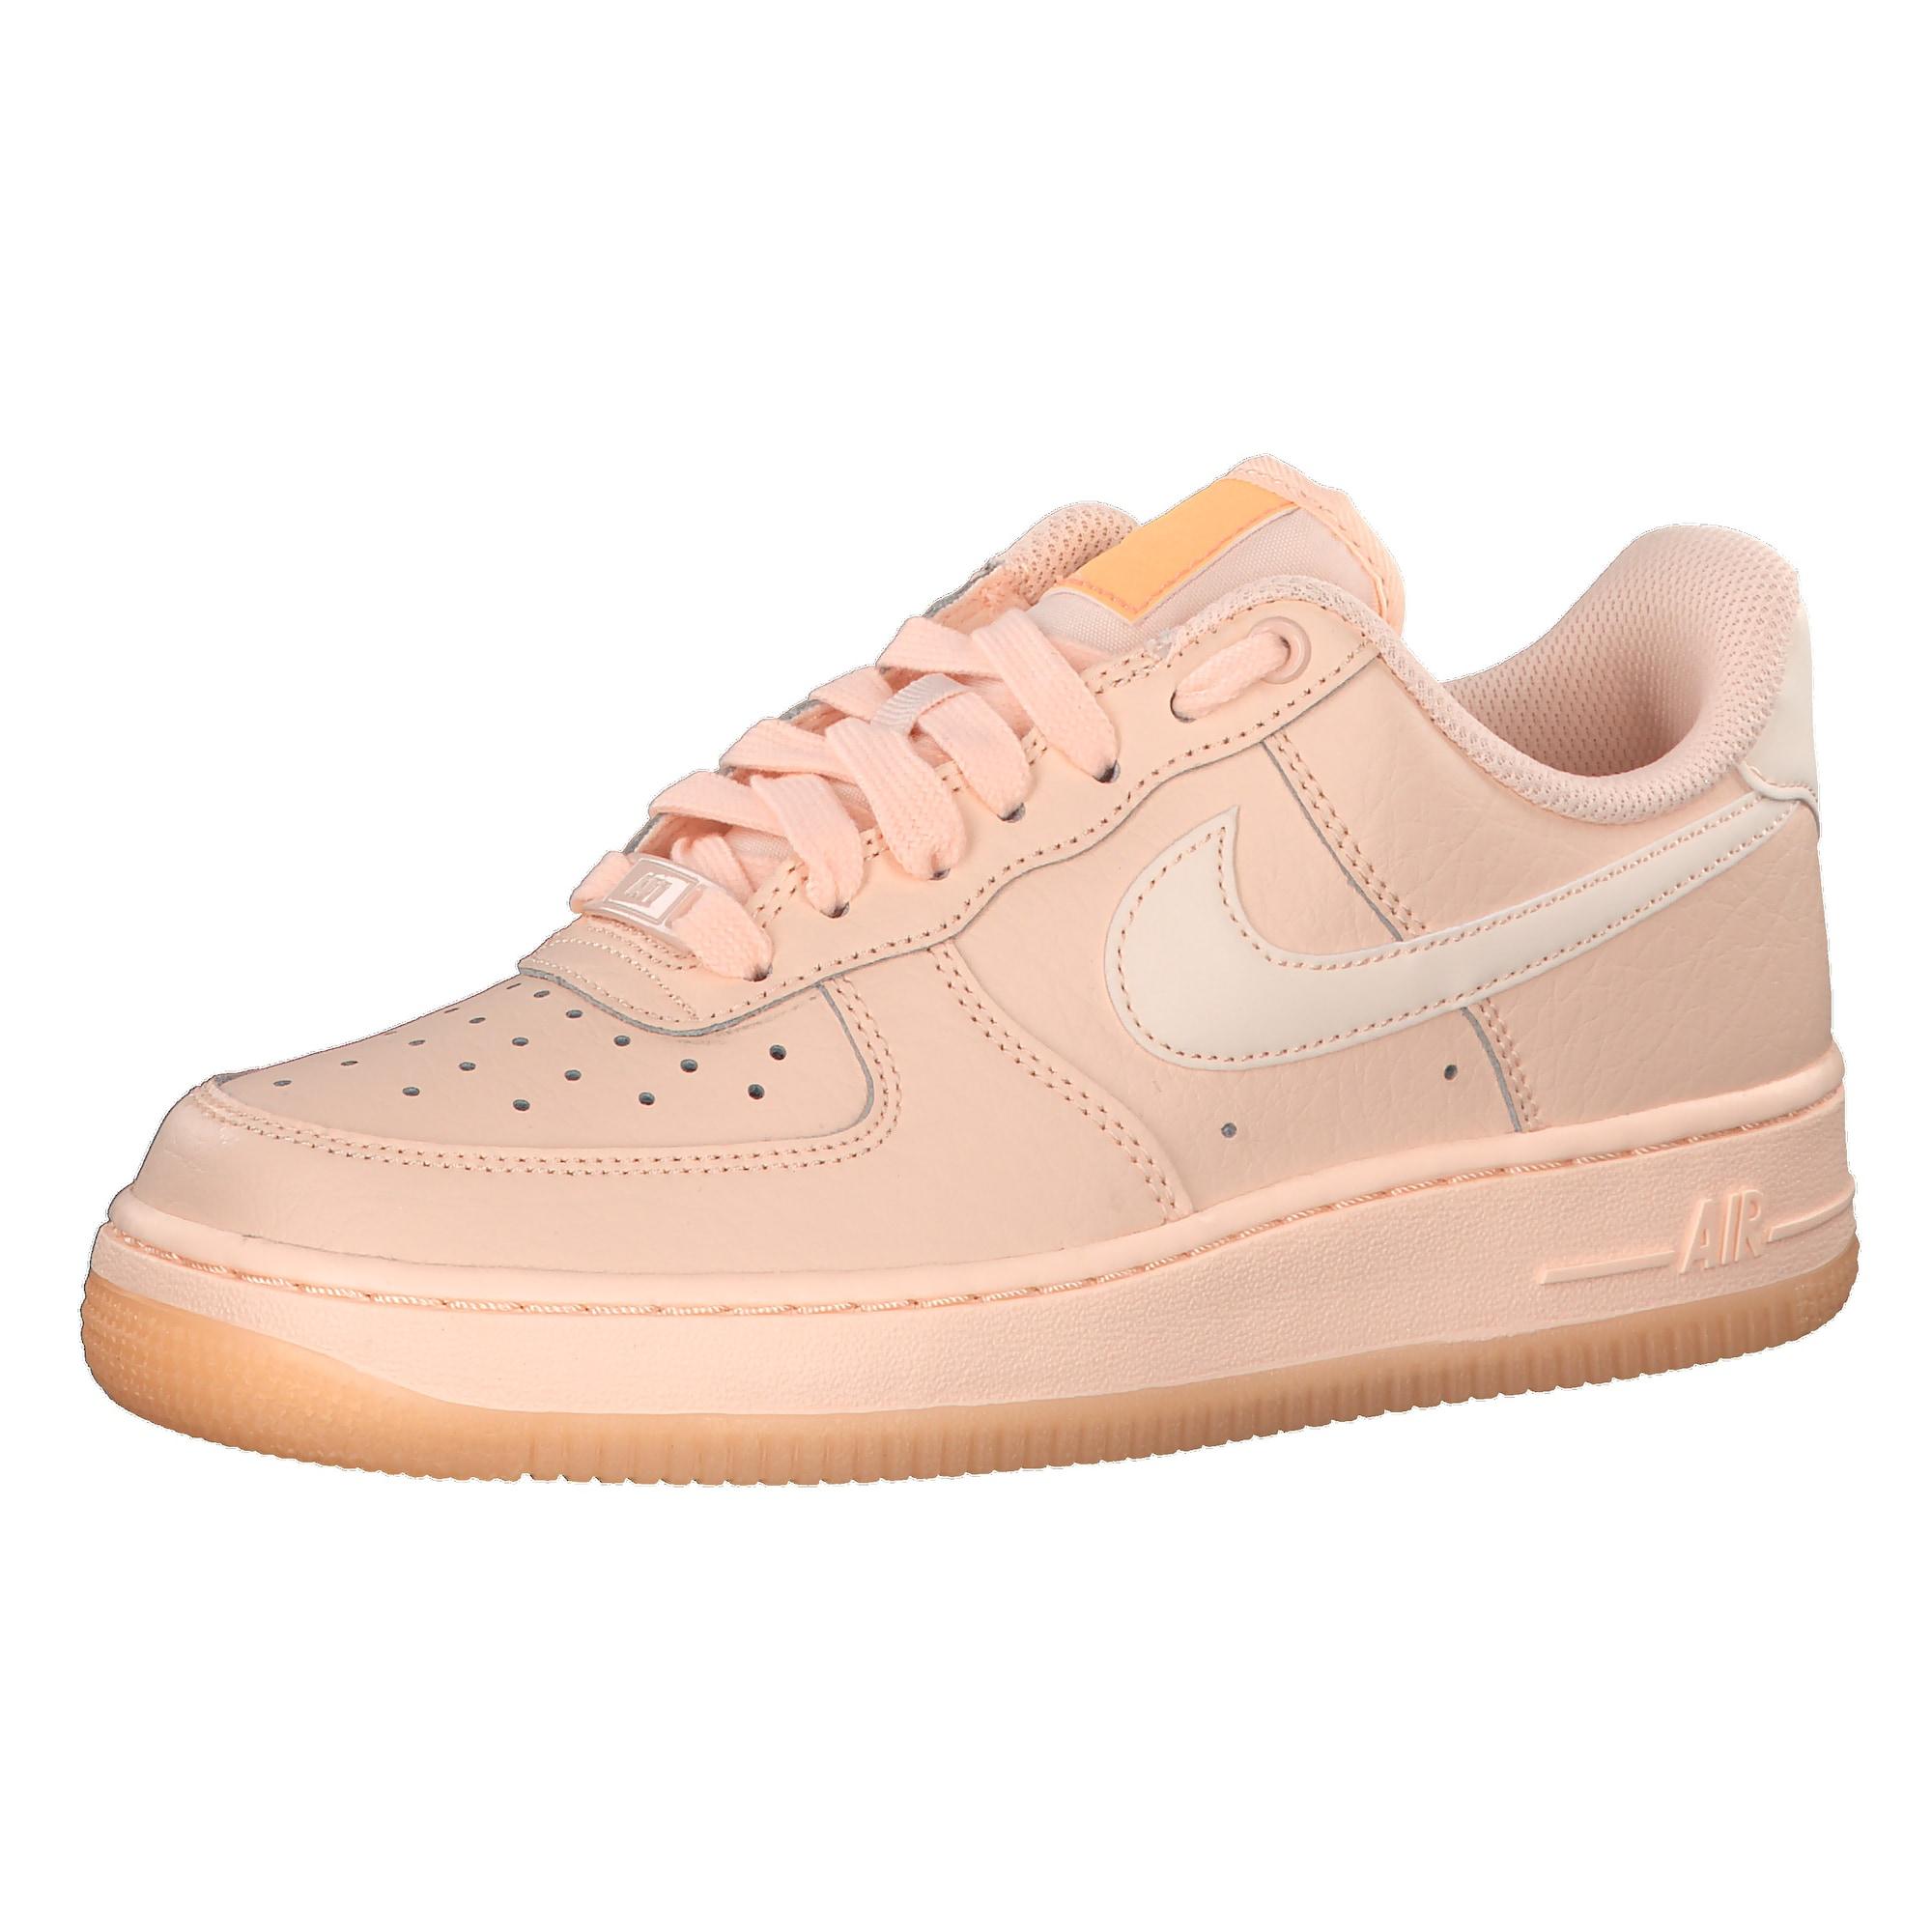 Tenisky Air Force 1 07 Essential broskvová Nike Sportswear